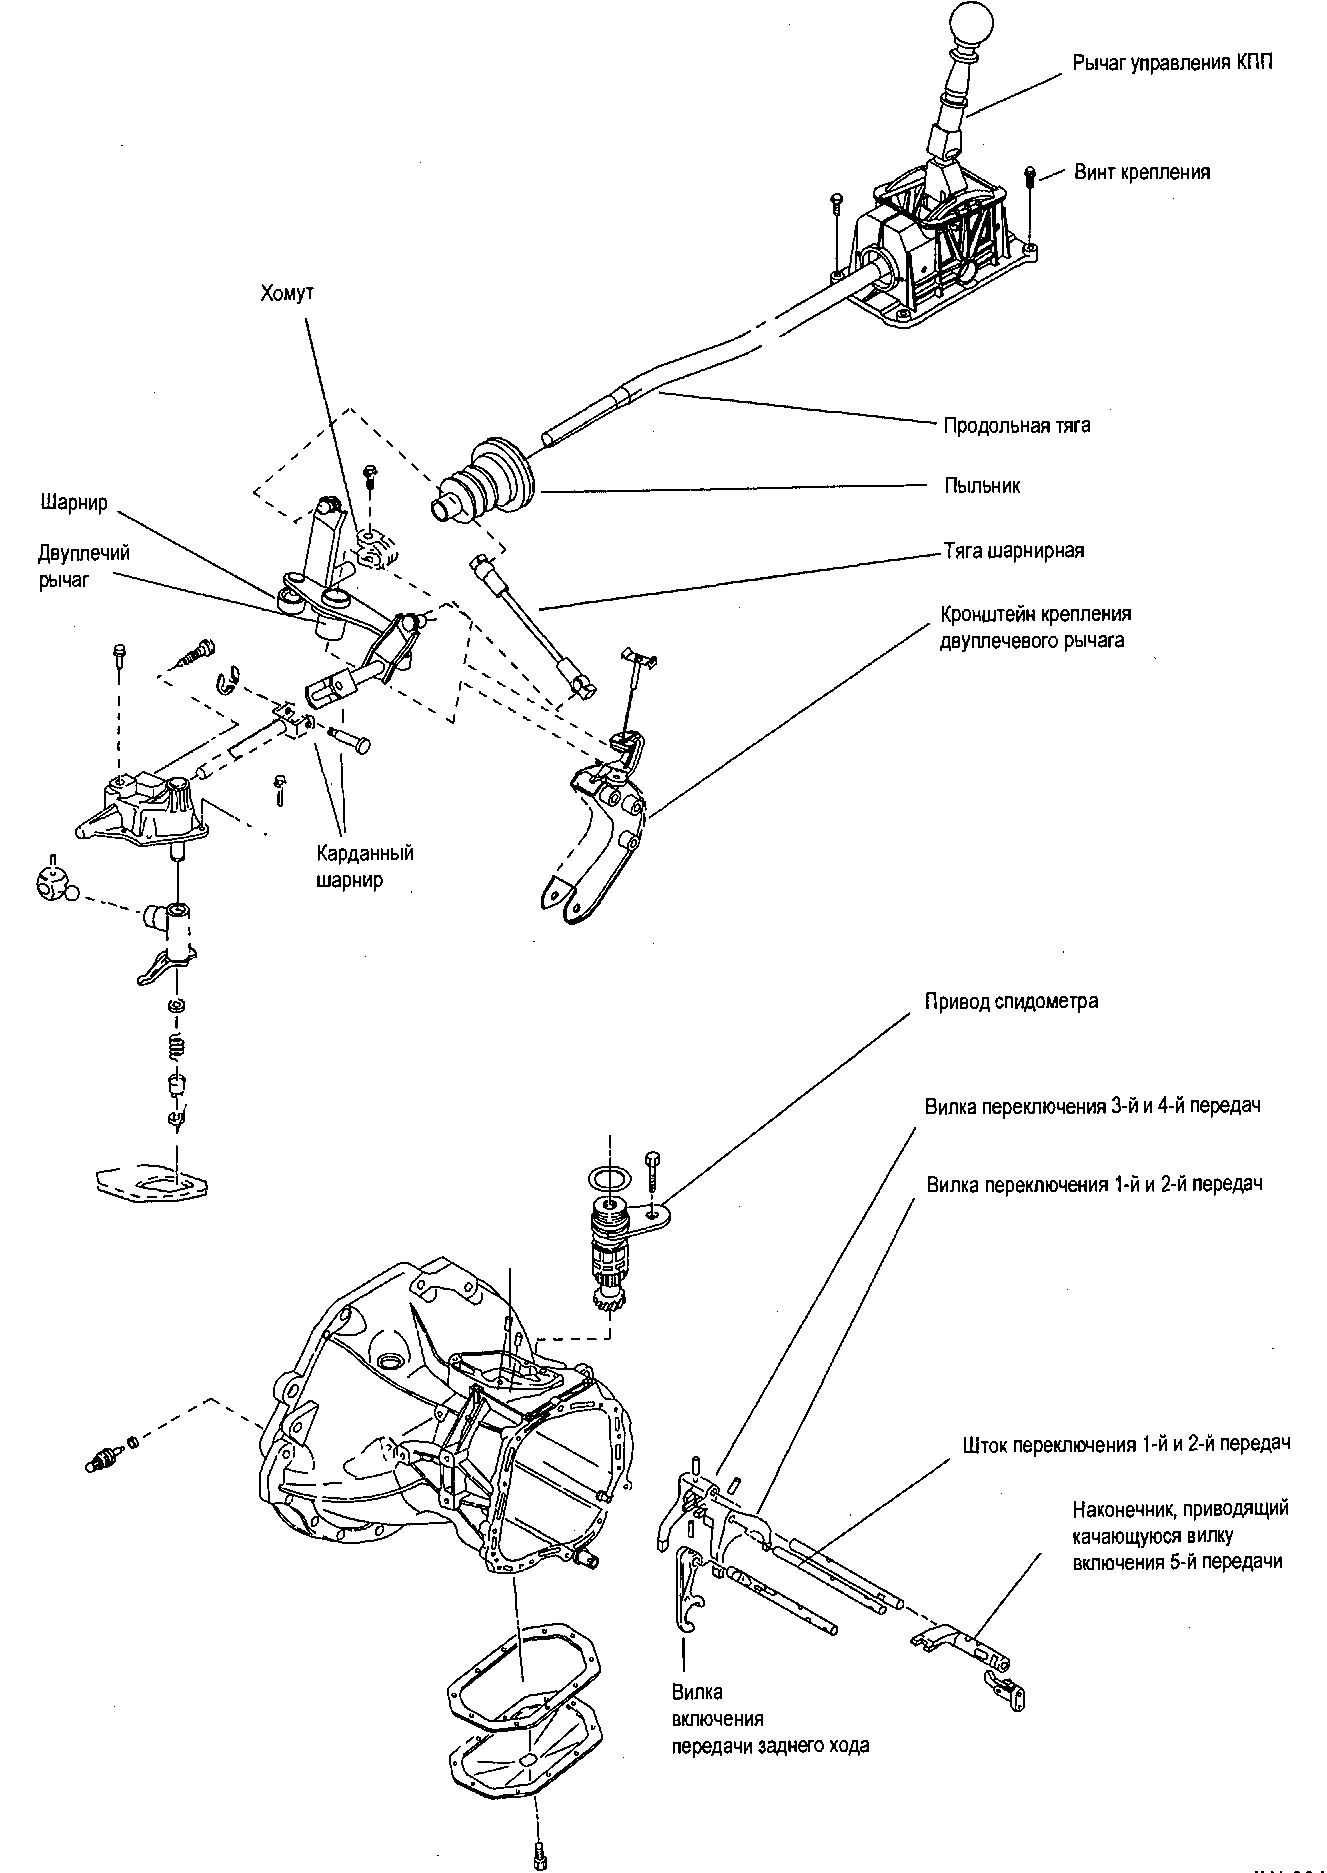 Замена масла в коробке передач шевроле